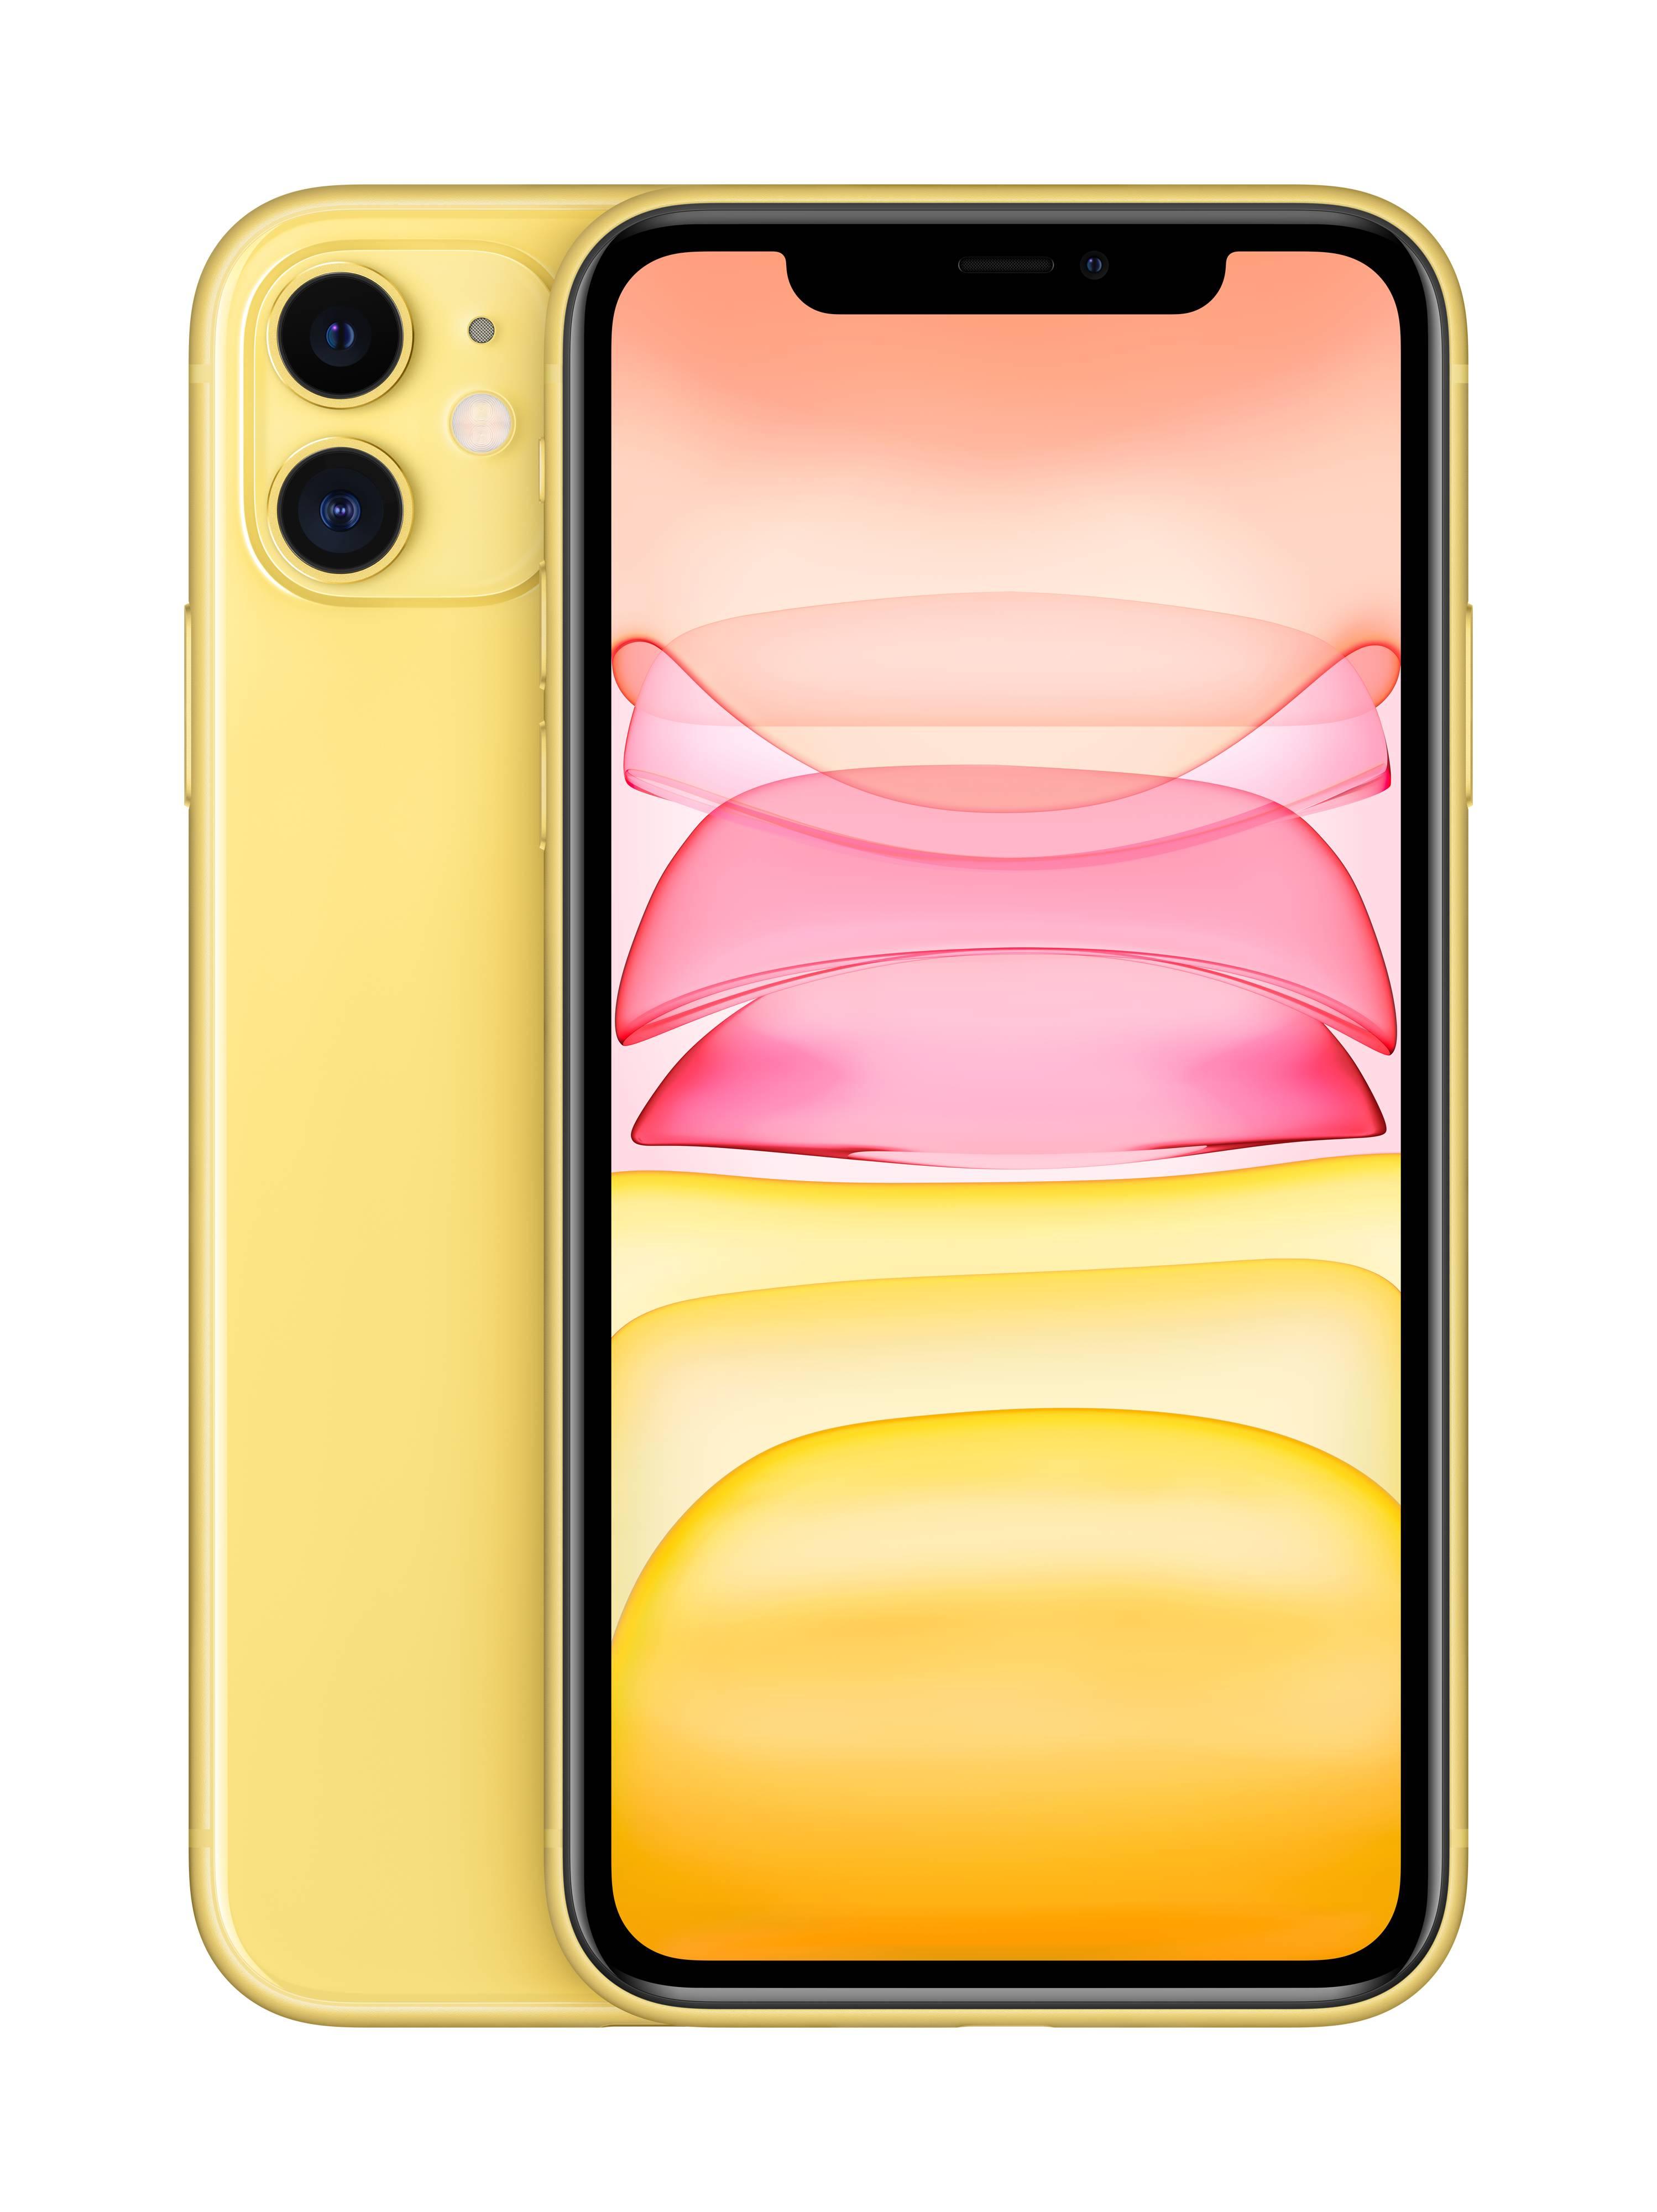 Apple iPhone 11 256 GB 6.1 Zoll (15.5 cm) iOS 13 12 Megapixel Gelb